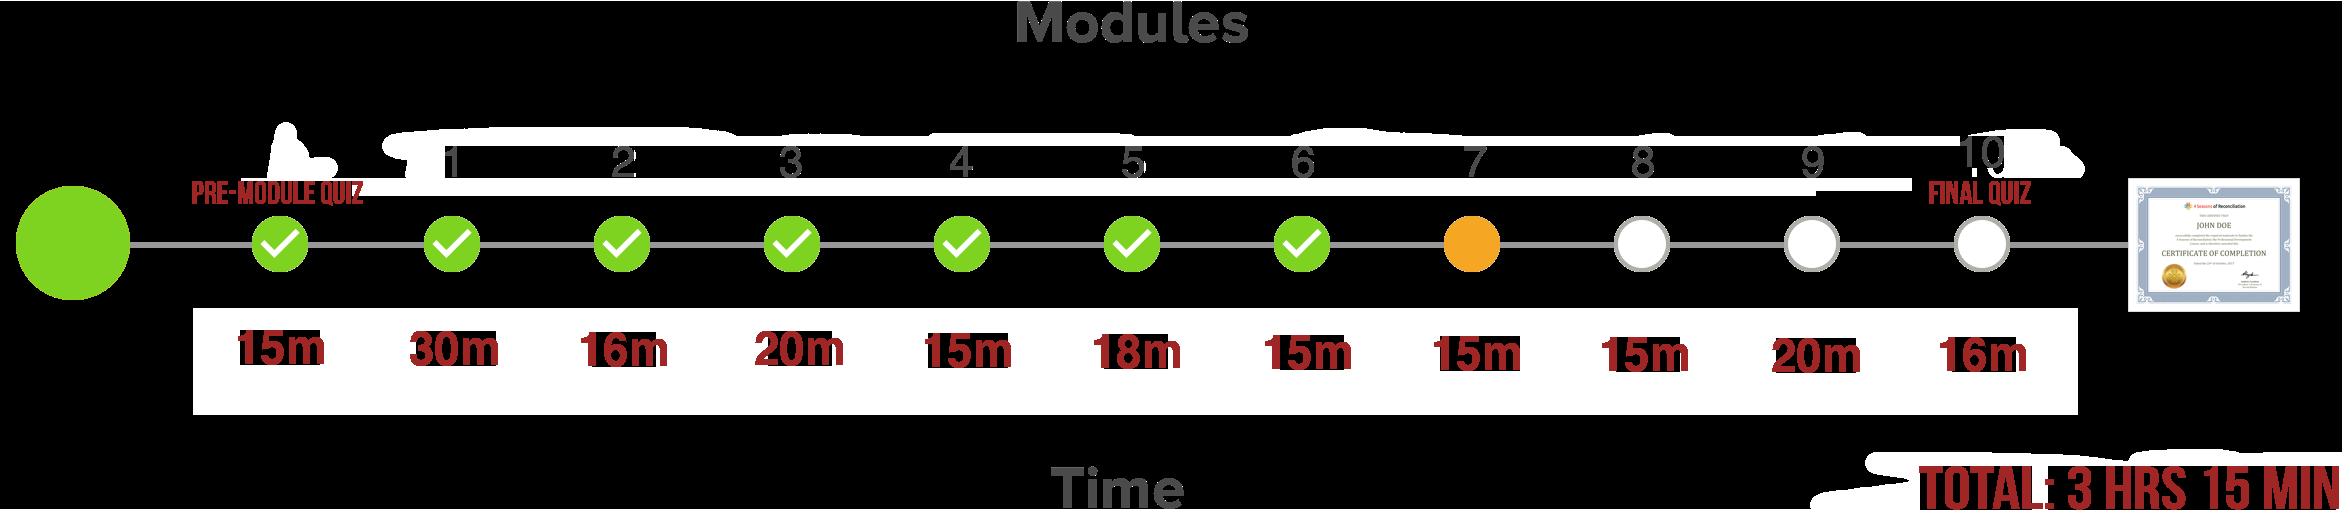 Module7_Orange.png